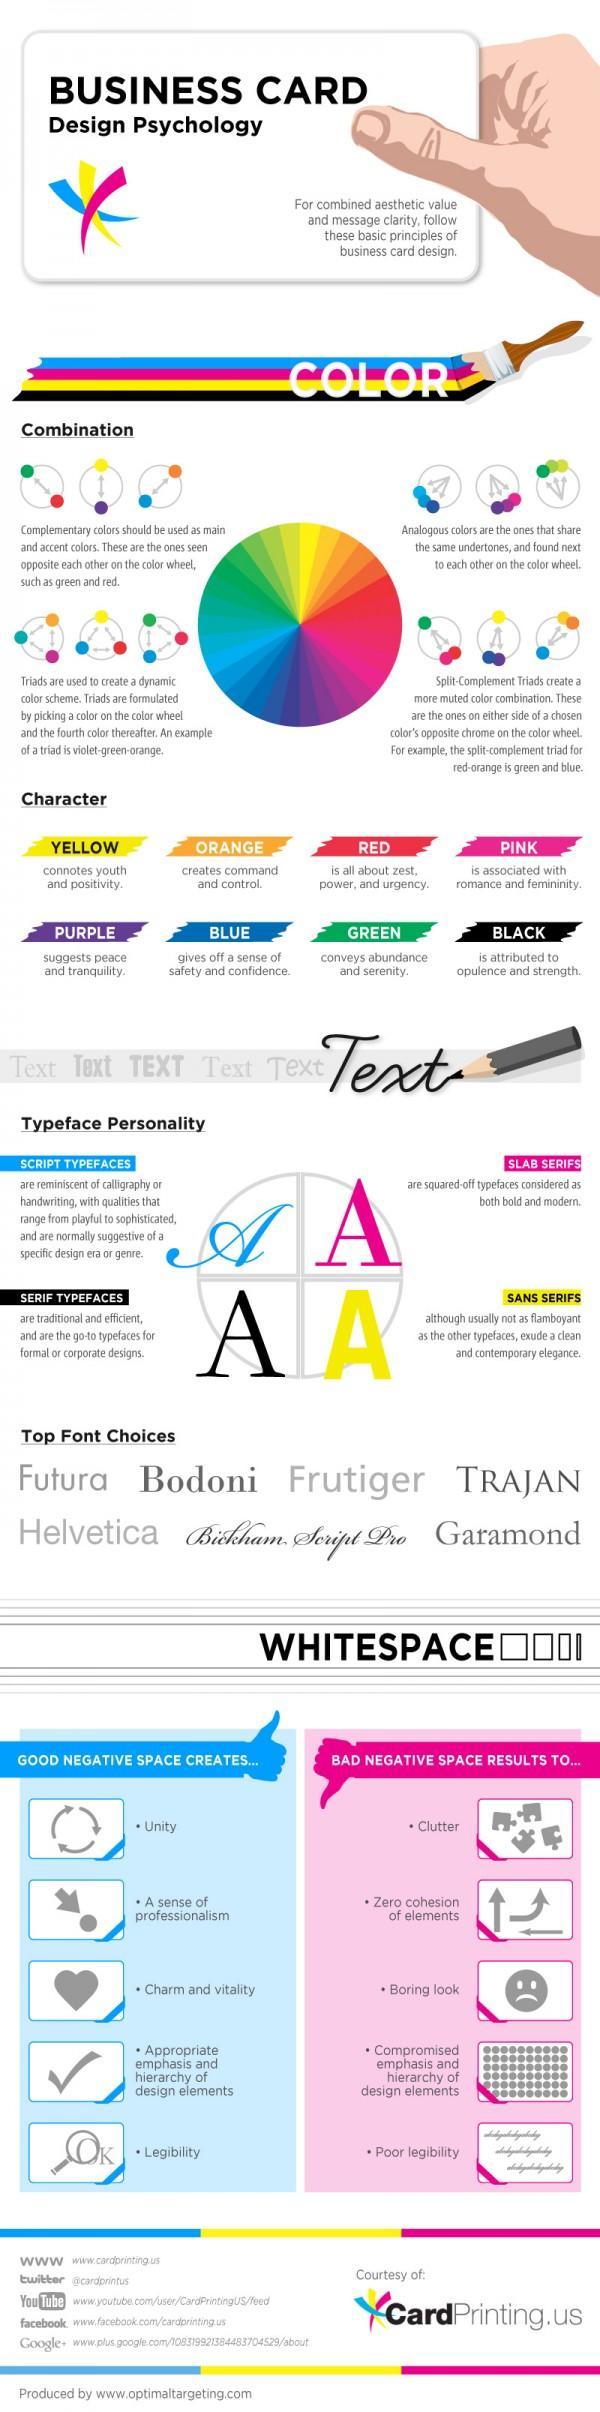 20130118-Business-Card-Design-Psychology4-e1358793483572